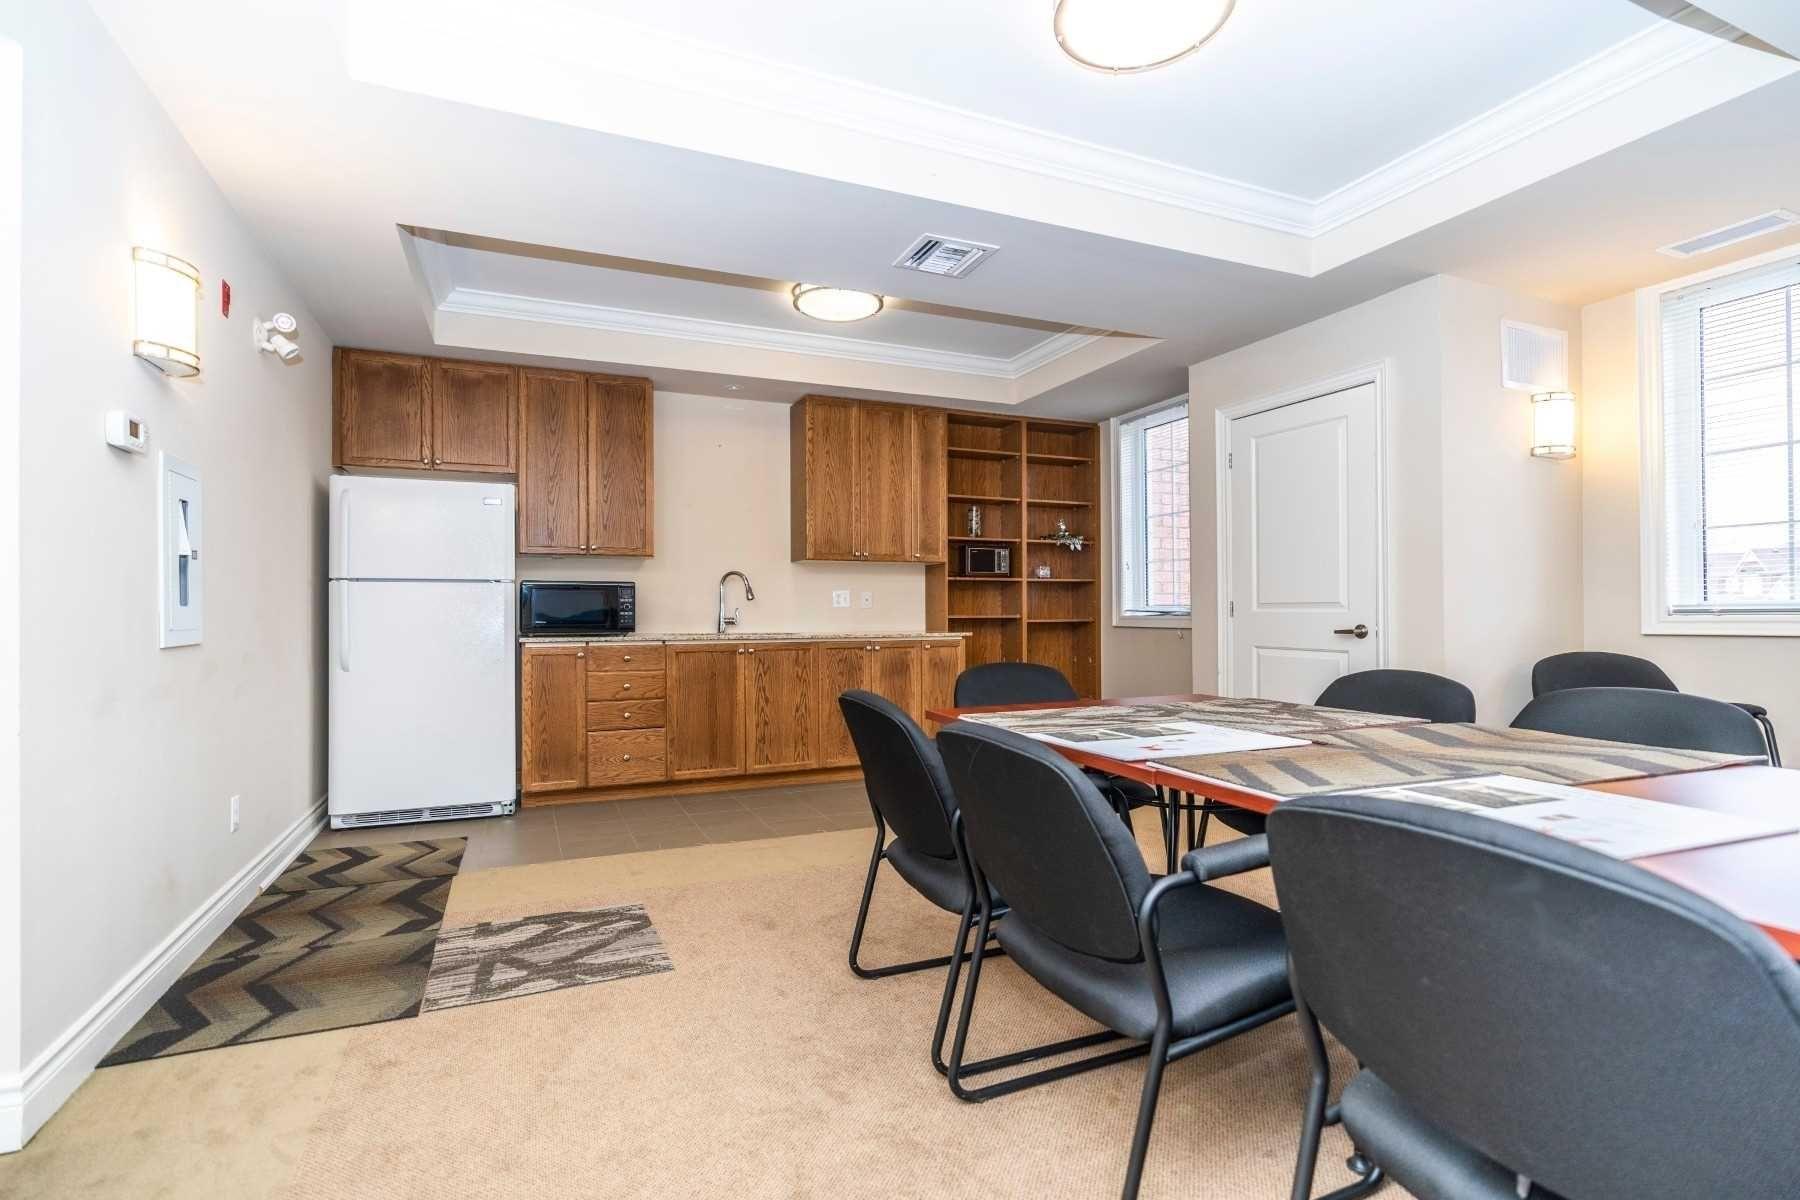 Photo 15: Photos: 213 54 Harvey Johnston Way in Whitby: Brooklin Condo for sale : MLS®# E4664368